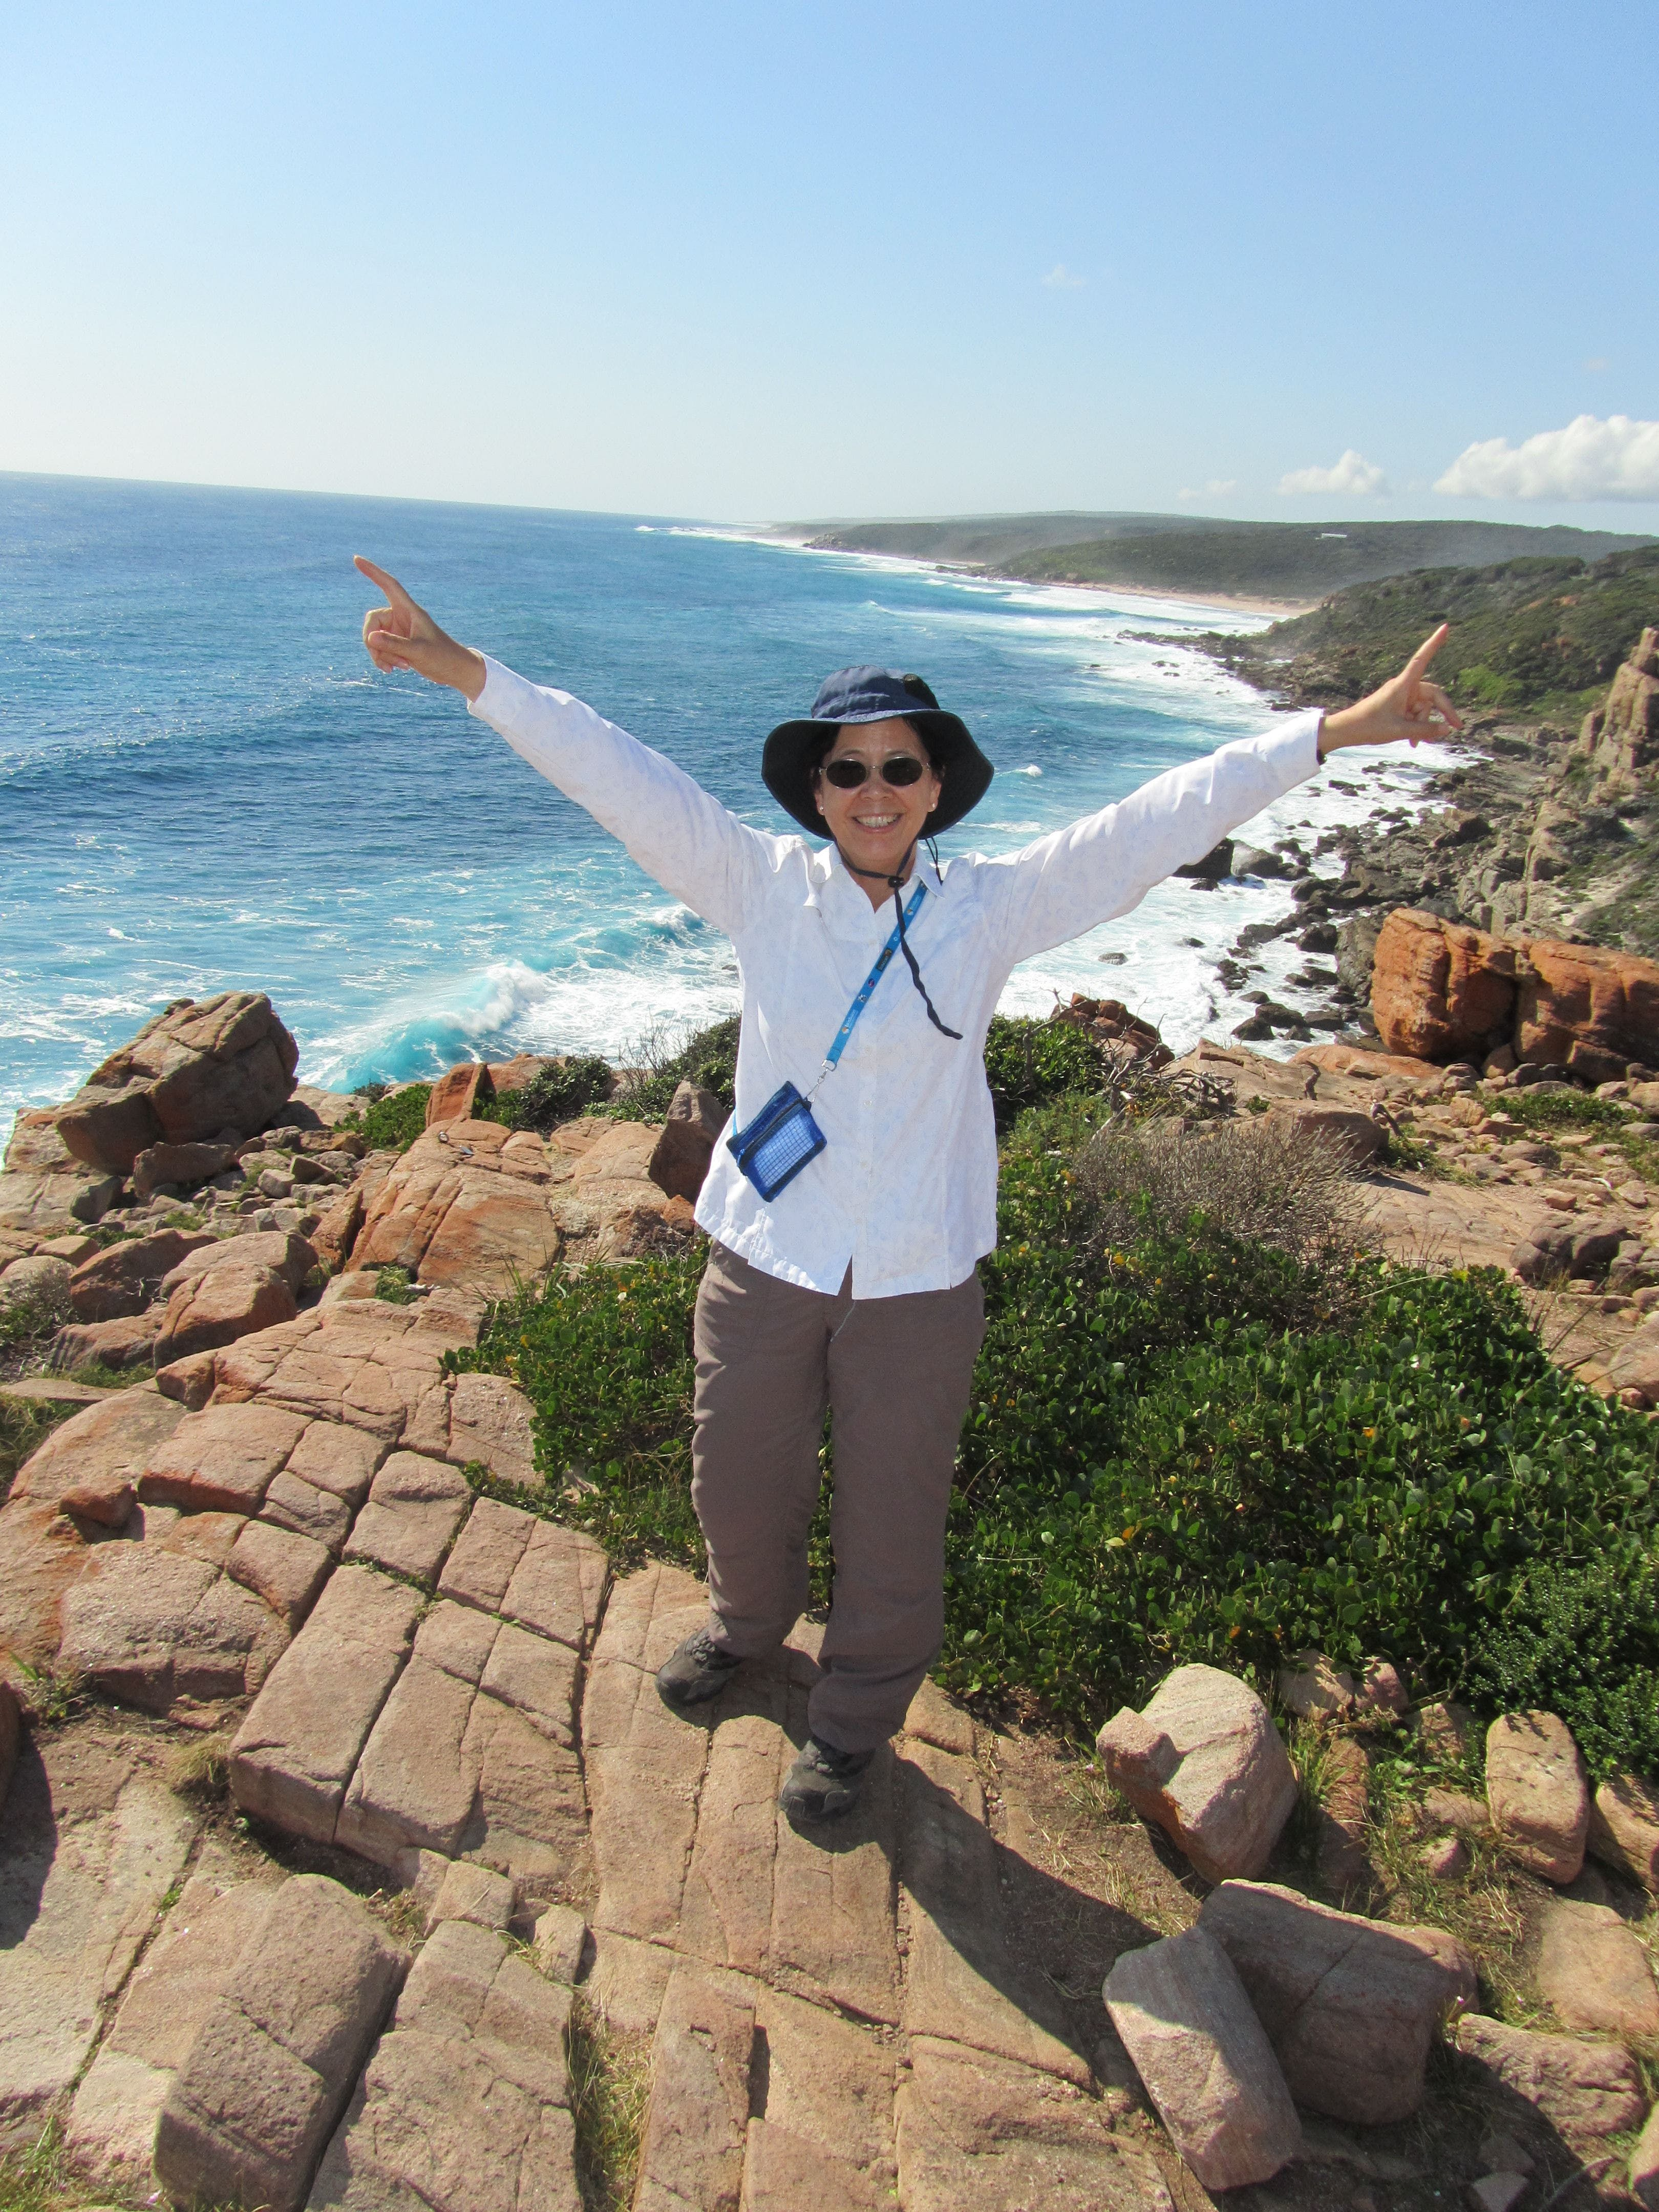 Auswalk Walking Holidays, Perth, Western Australia